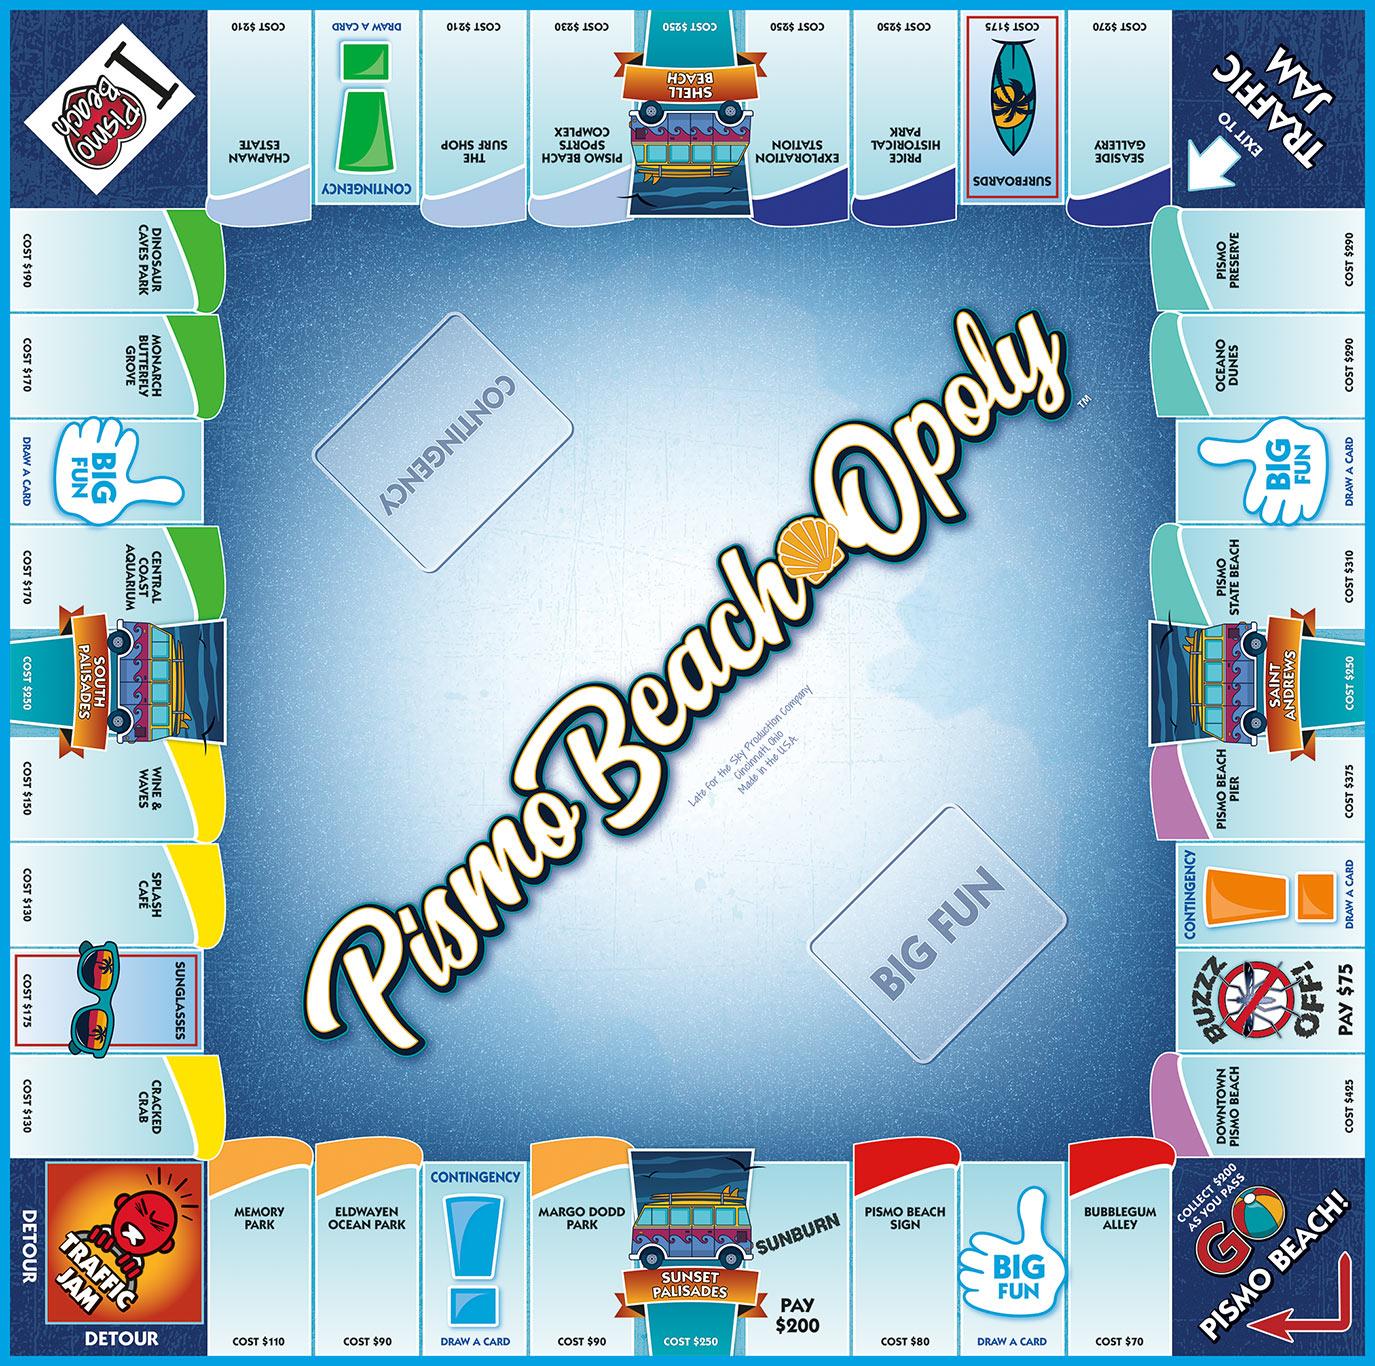 PISMO BEACH-OPOLY Board Game